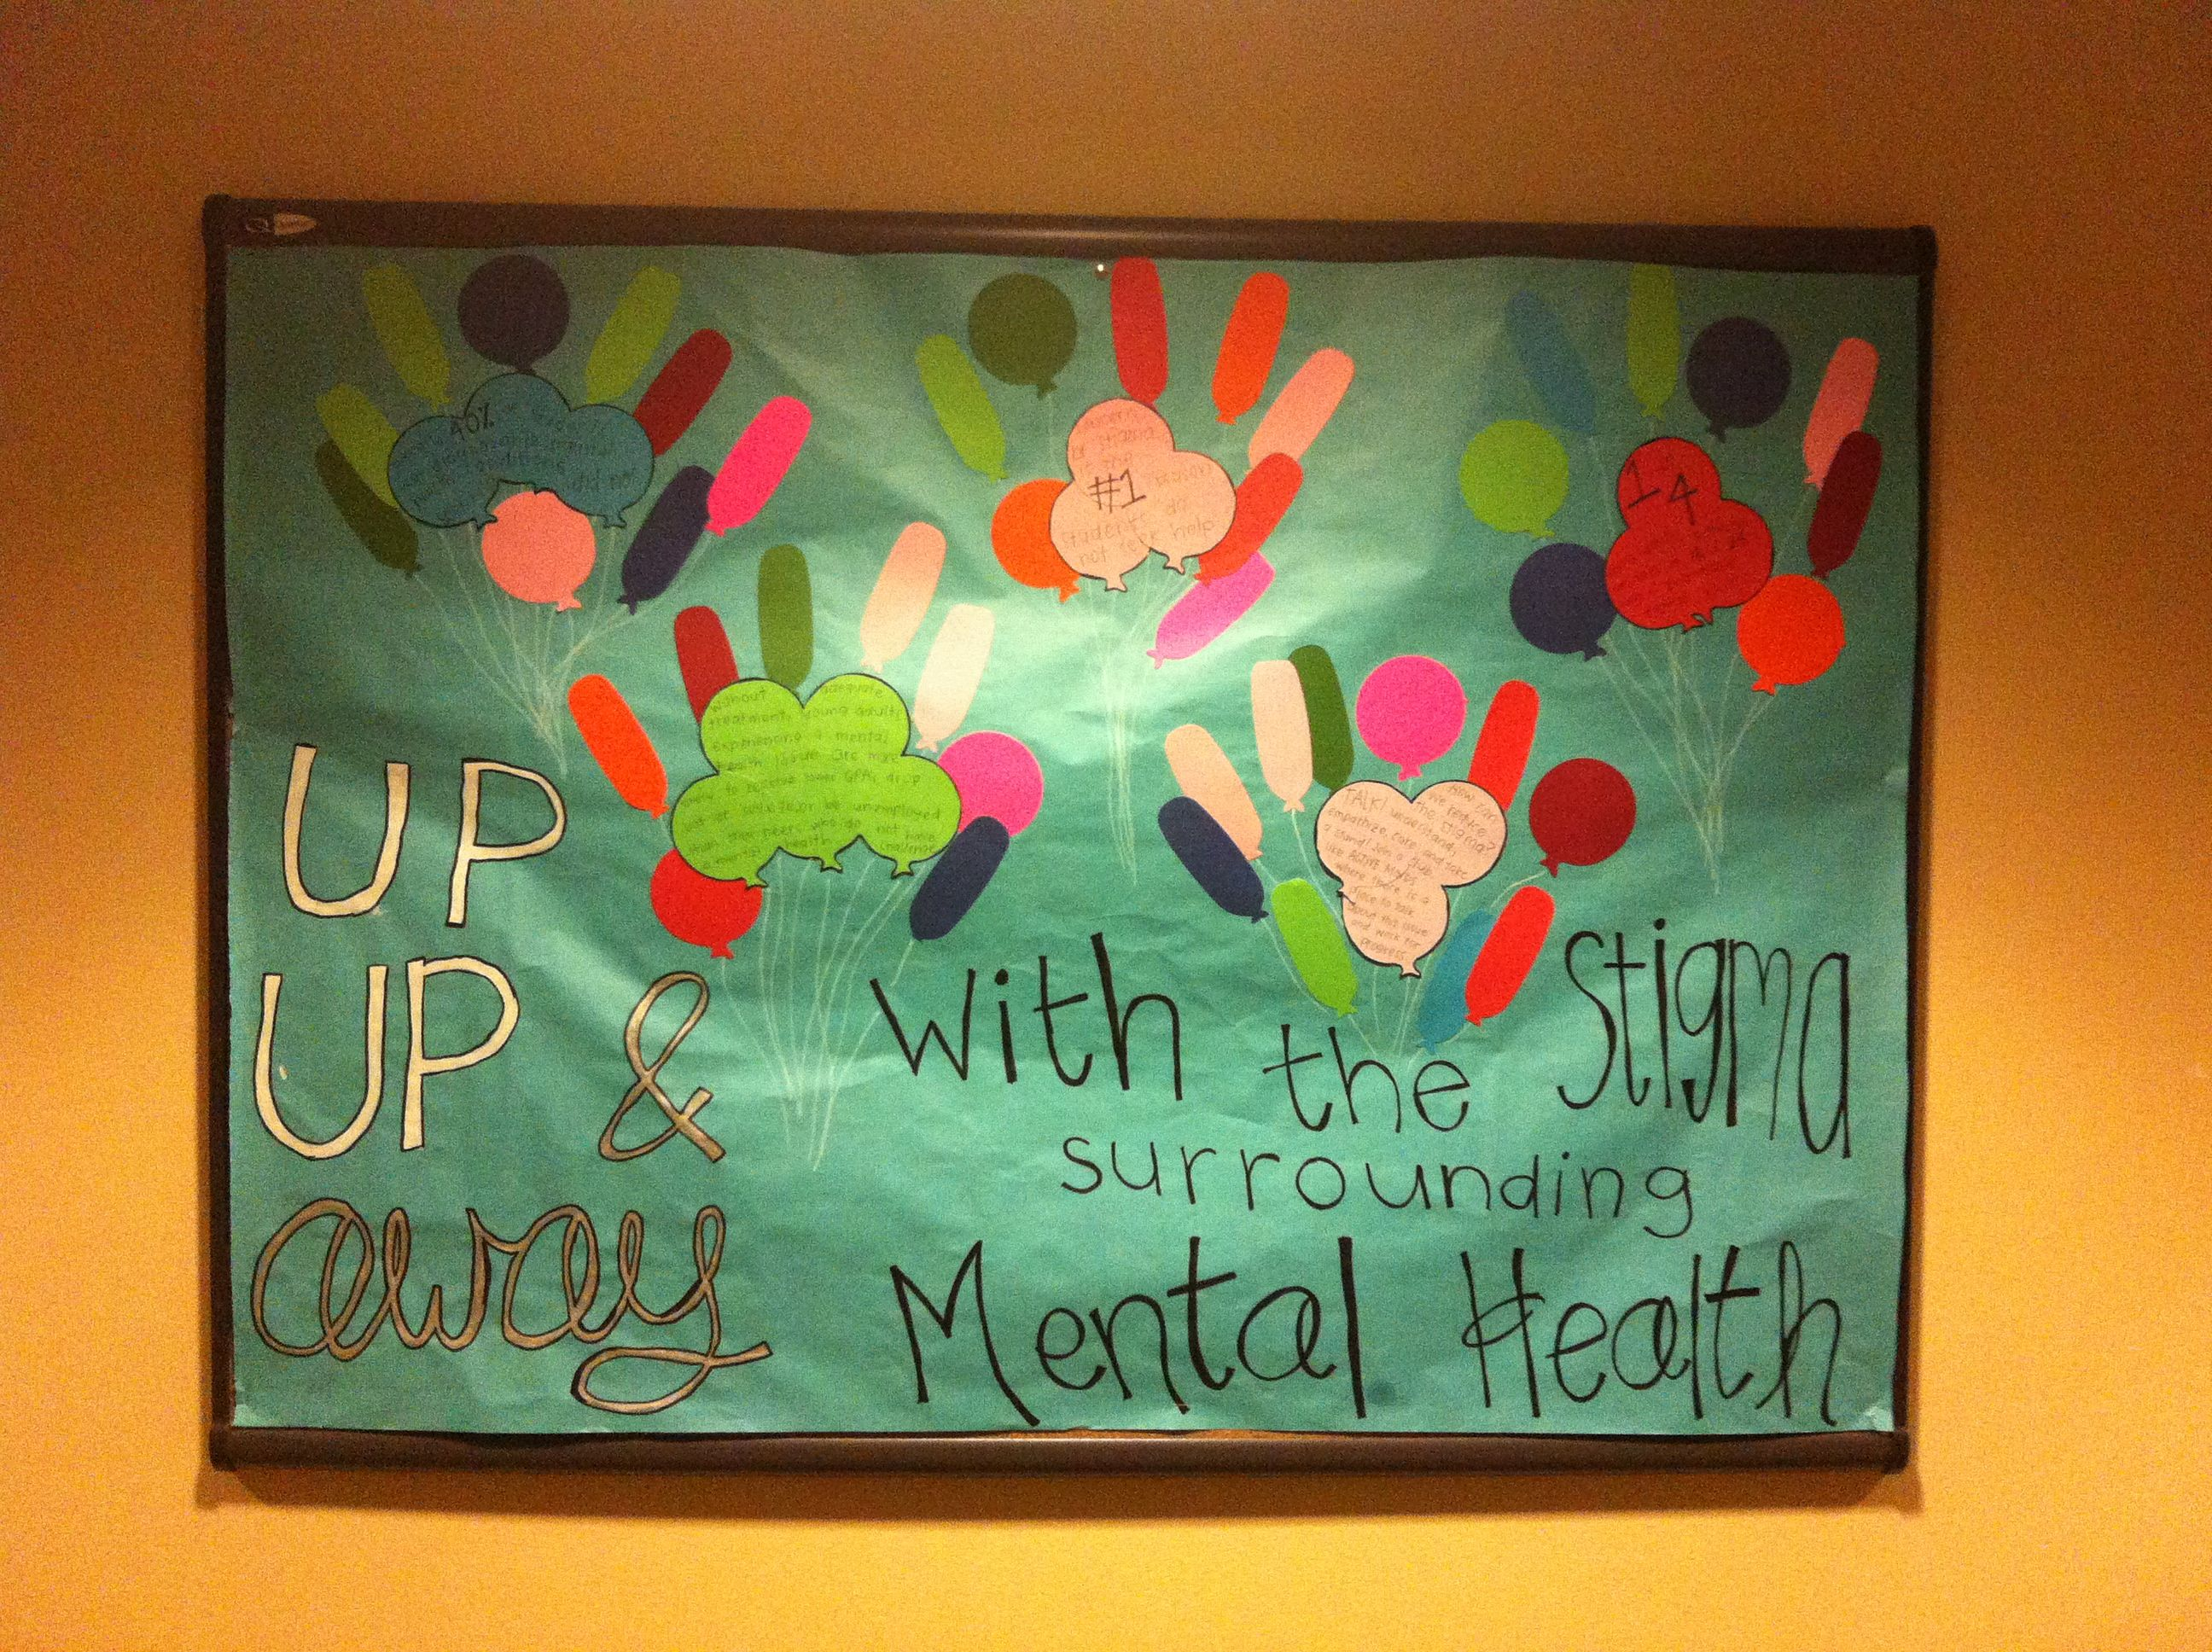 Bulletin Board Getting Rid Of The Stigma Surrounding Mental Health